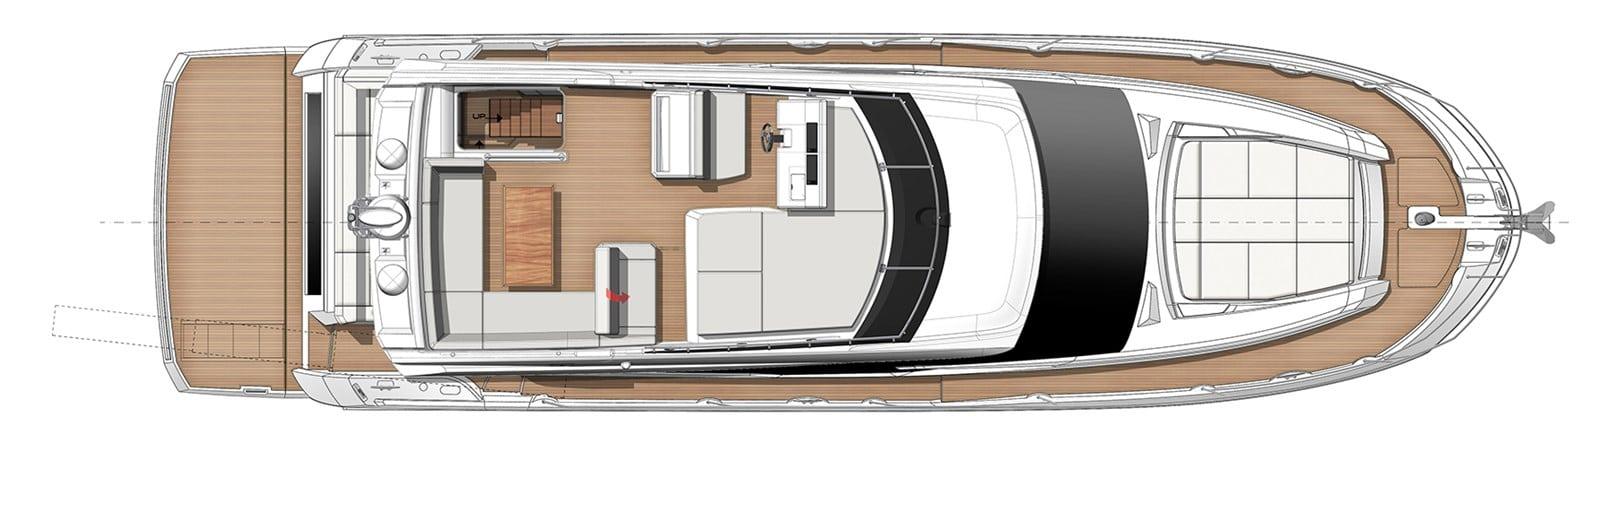 prestige yacht 520s yacht layout